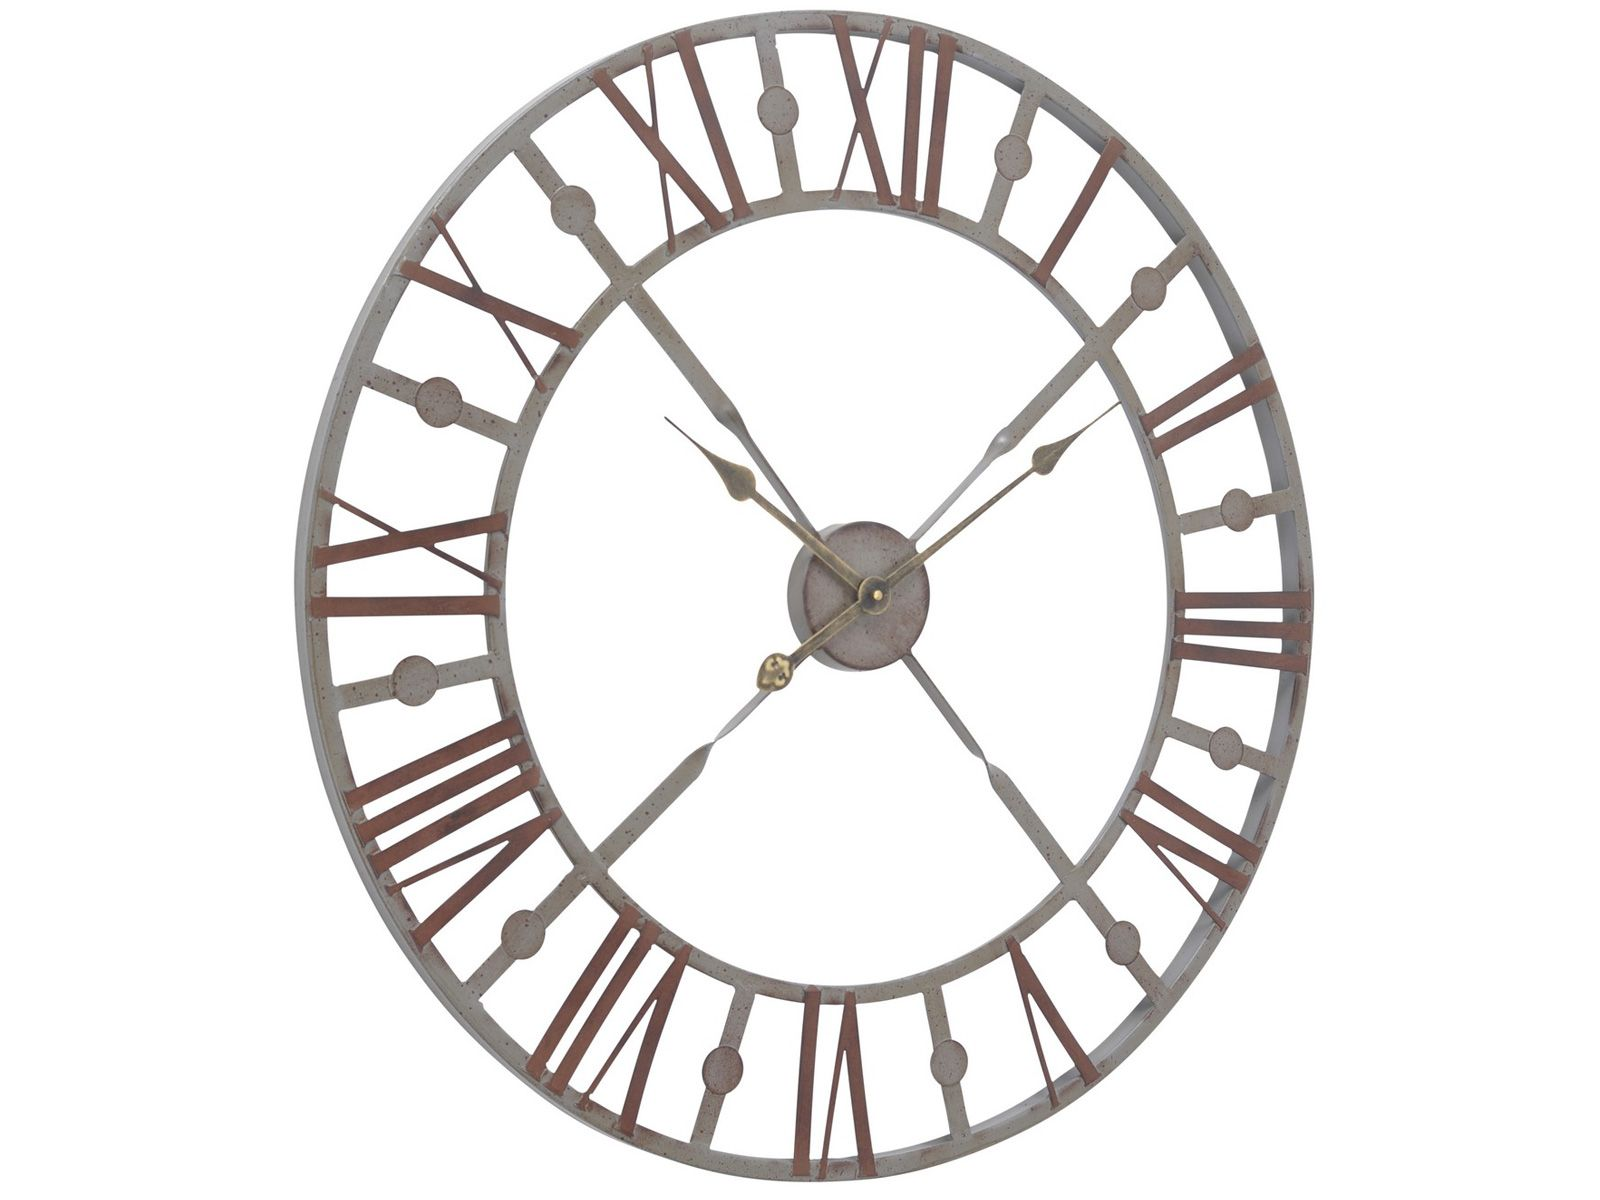 Accessories Antique grey skeleton wall clock | Wall clocks ...